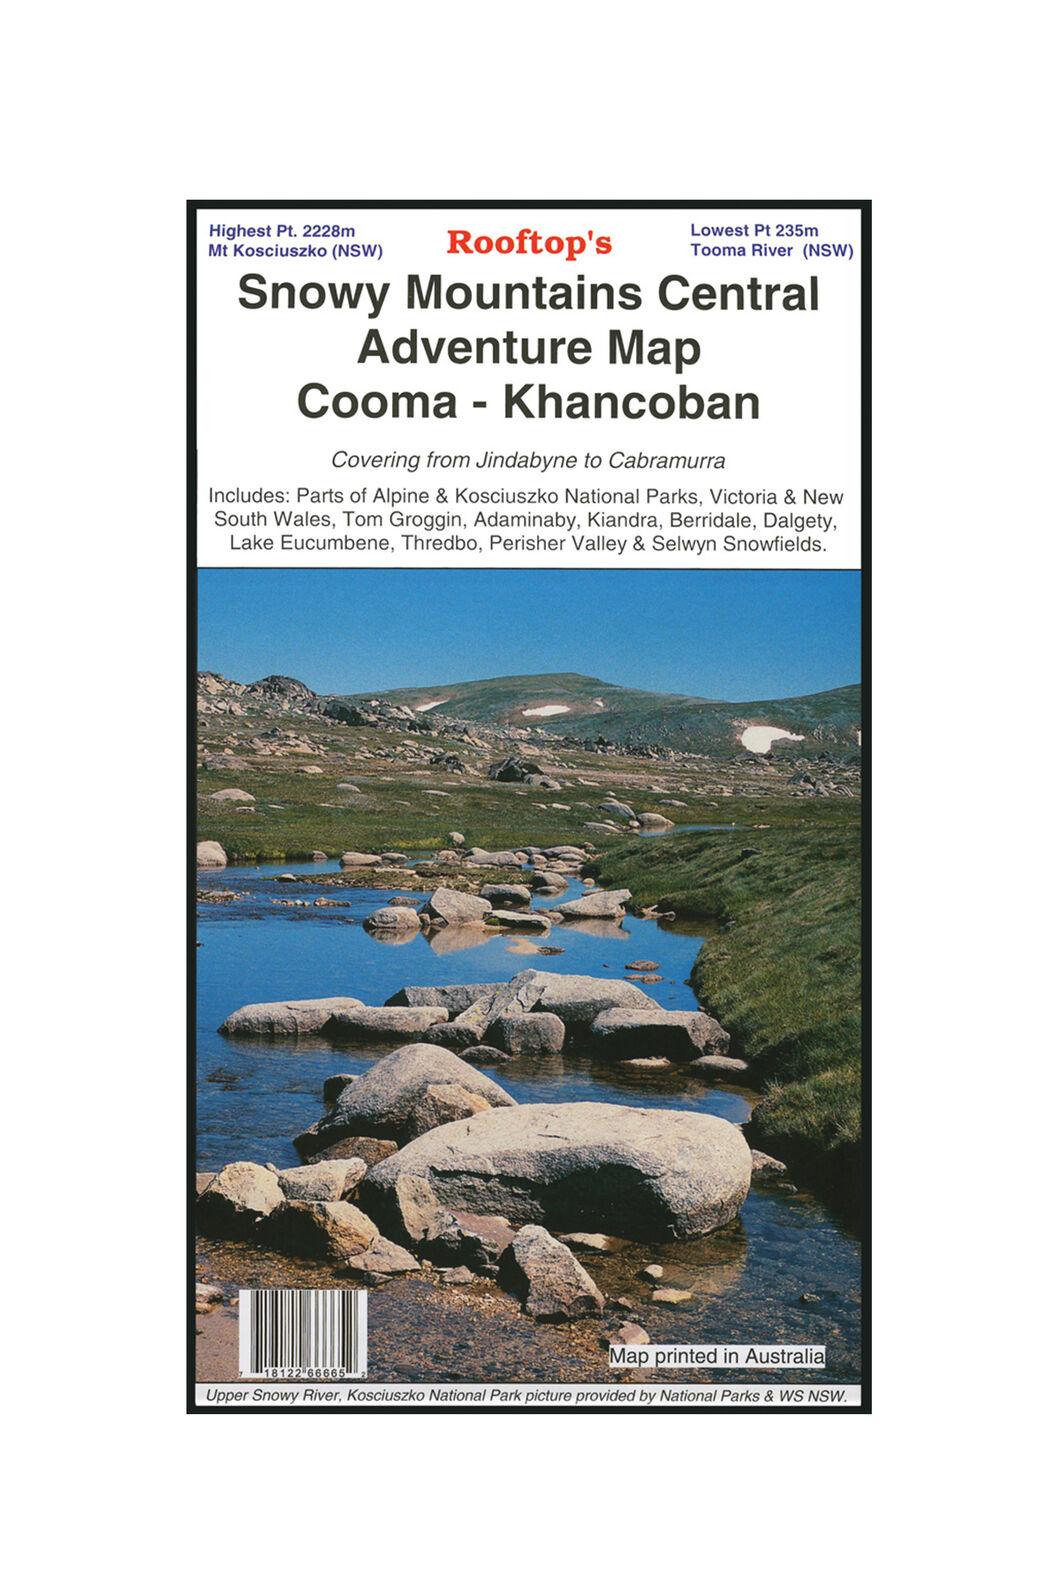 Hema Snowy Mountains Central Khancoban Map, None, hi-res